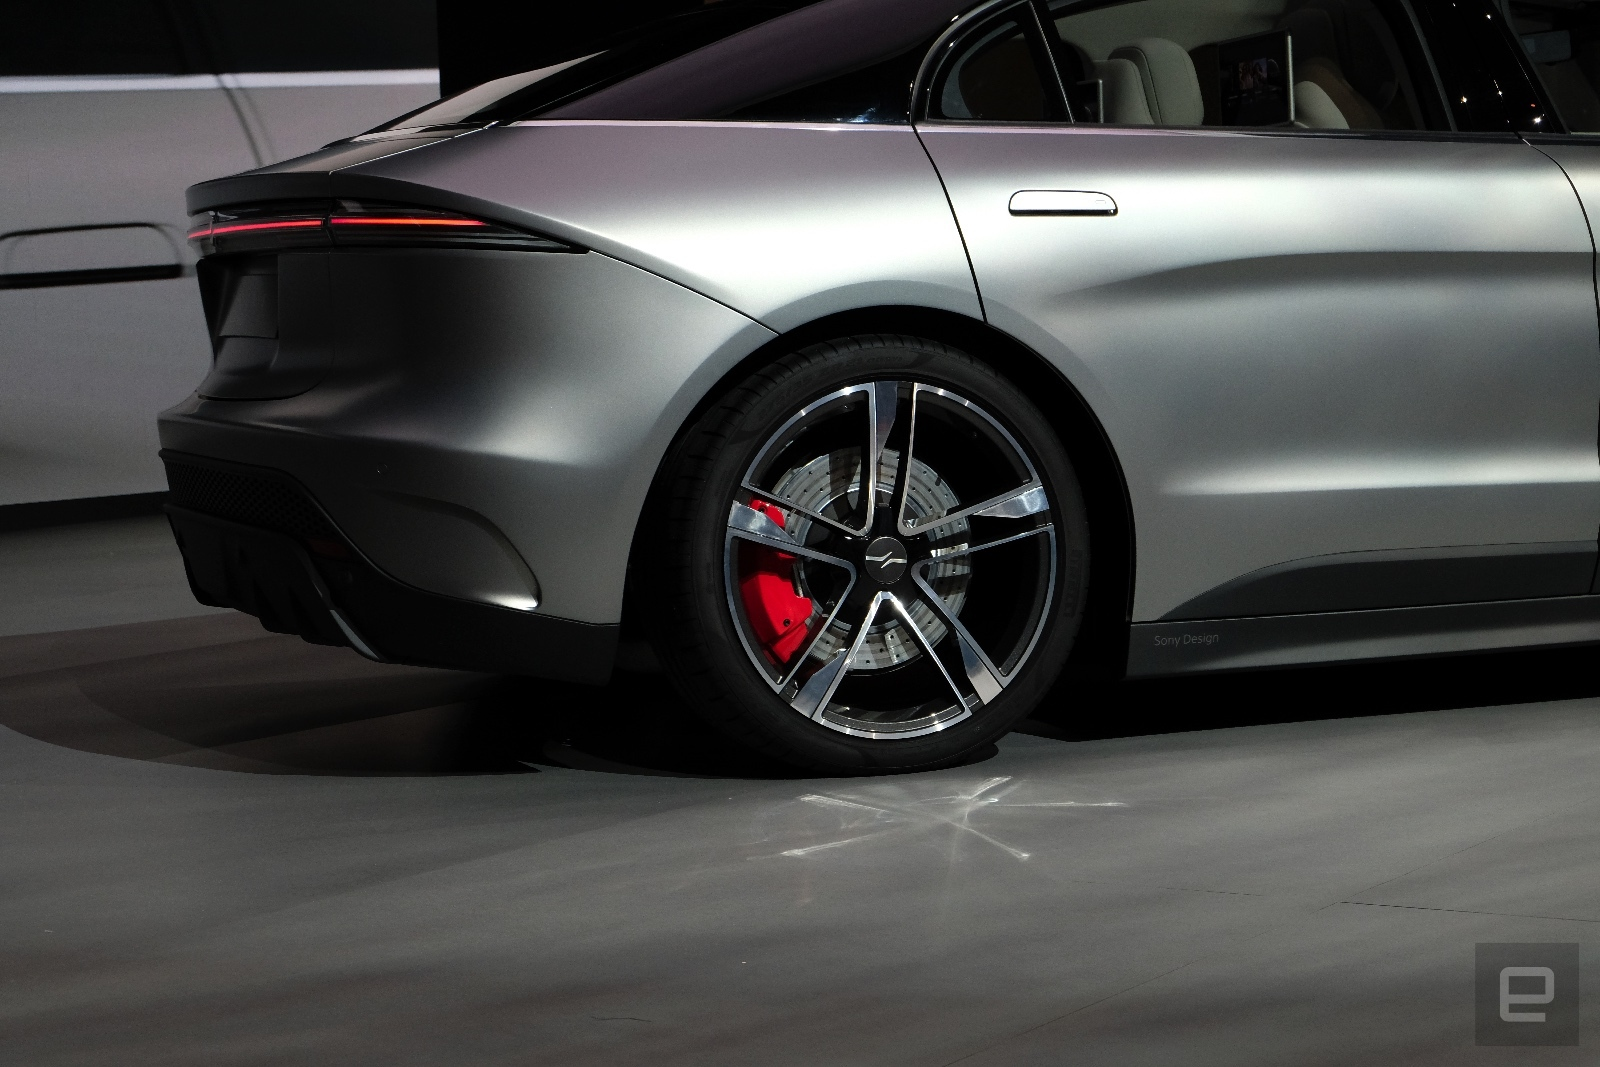 sony vision s prototype car 14442424224